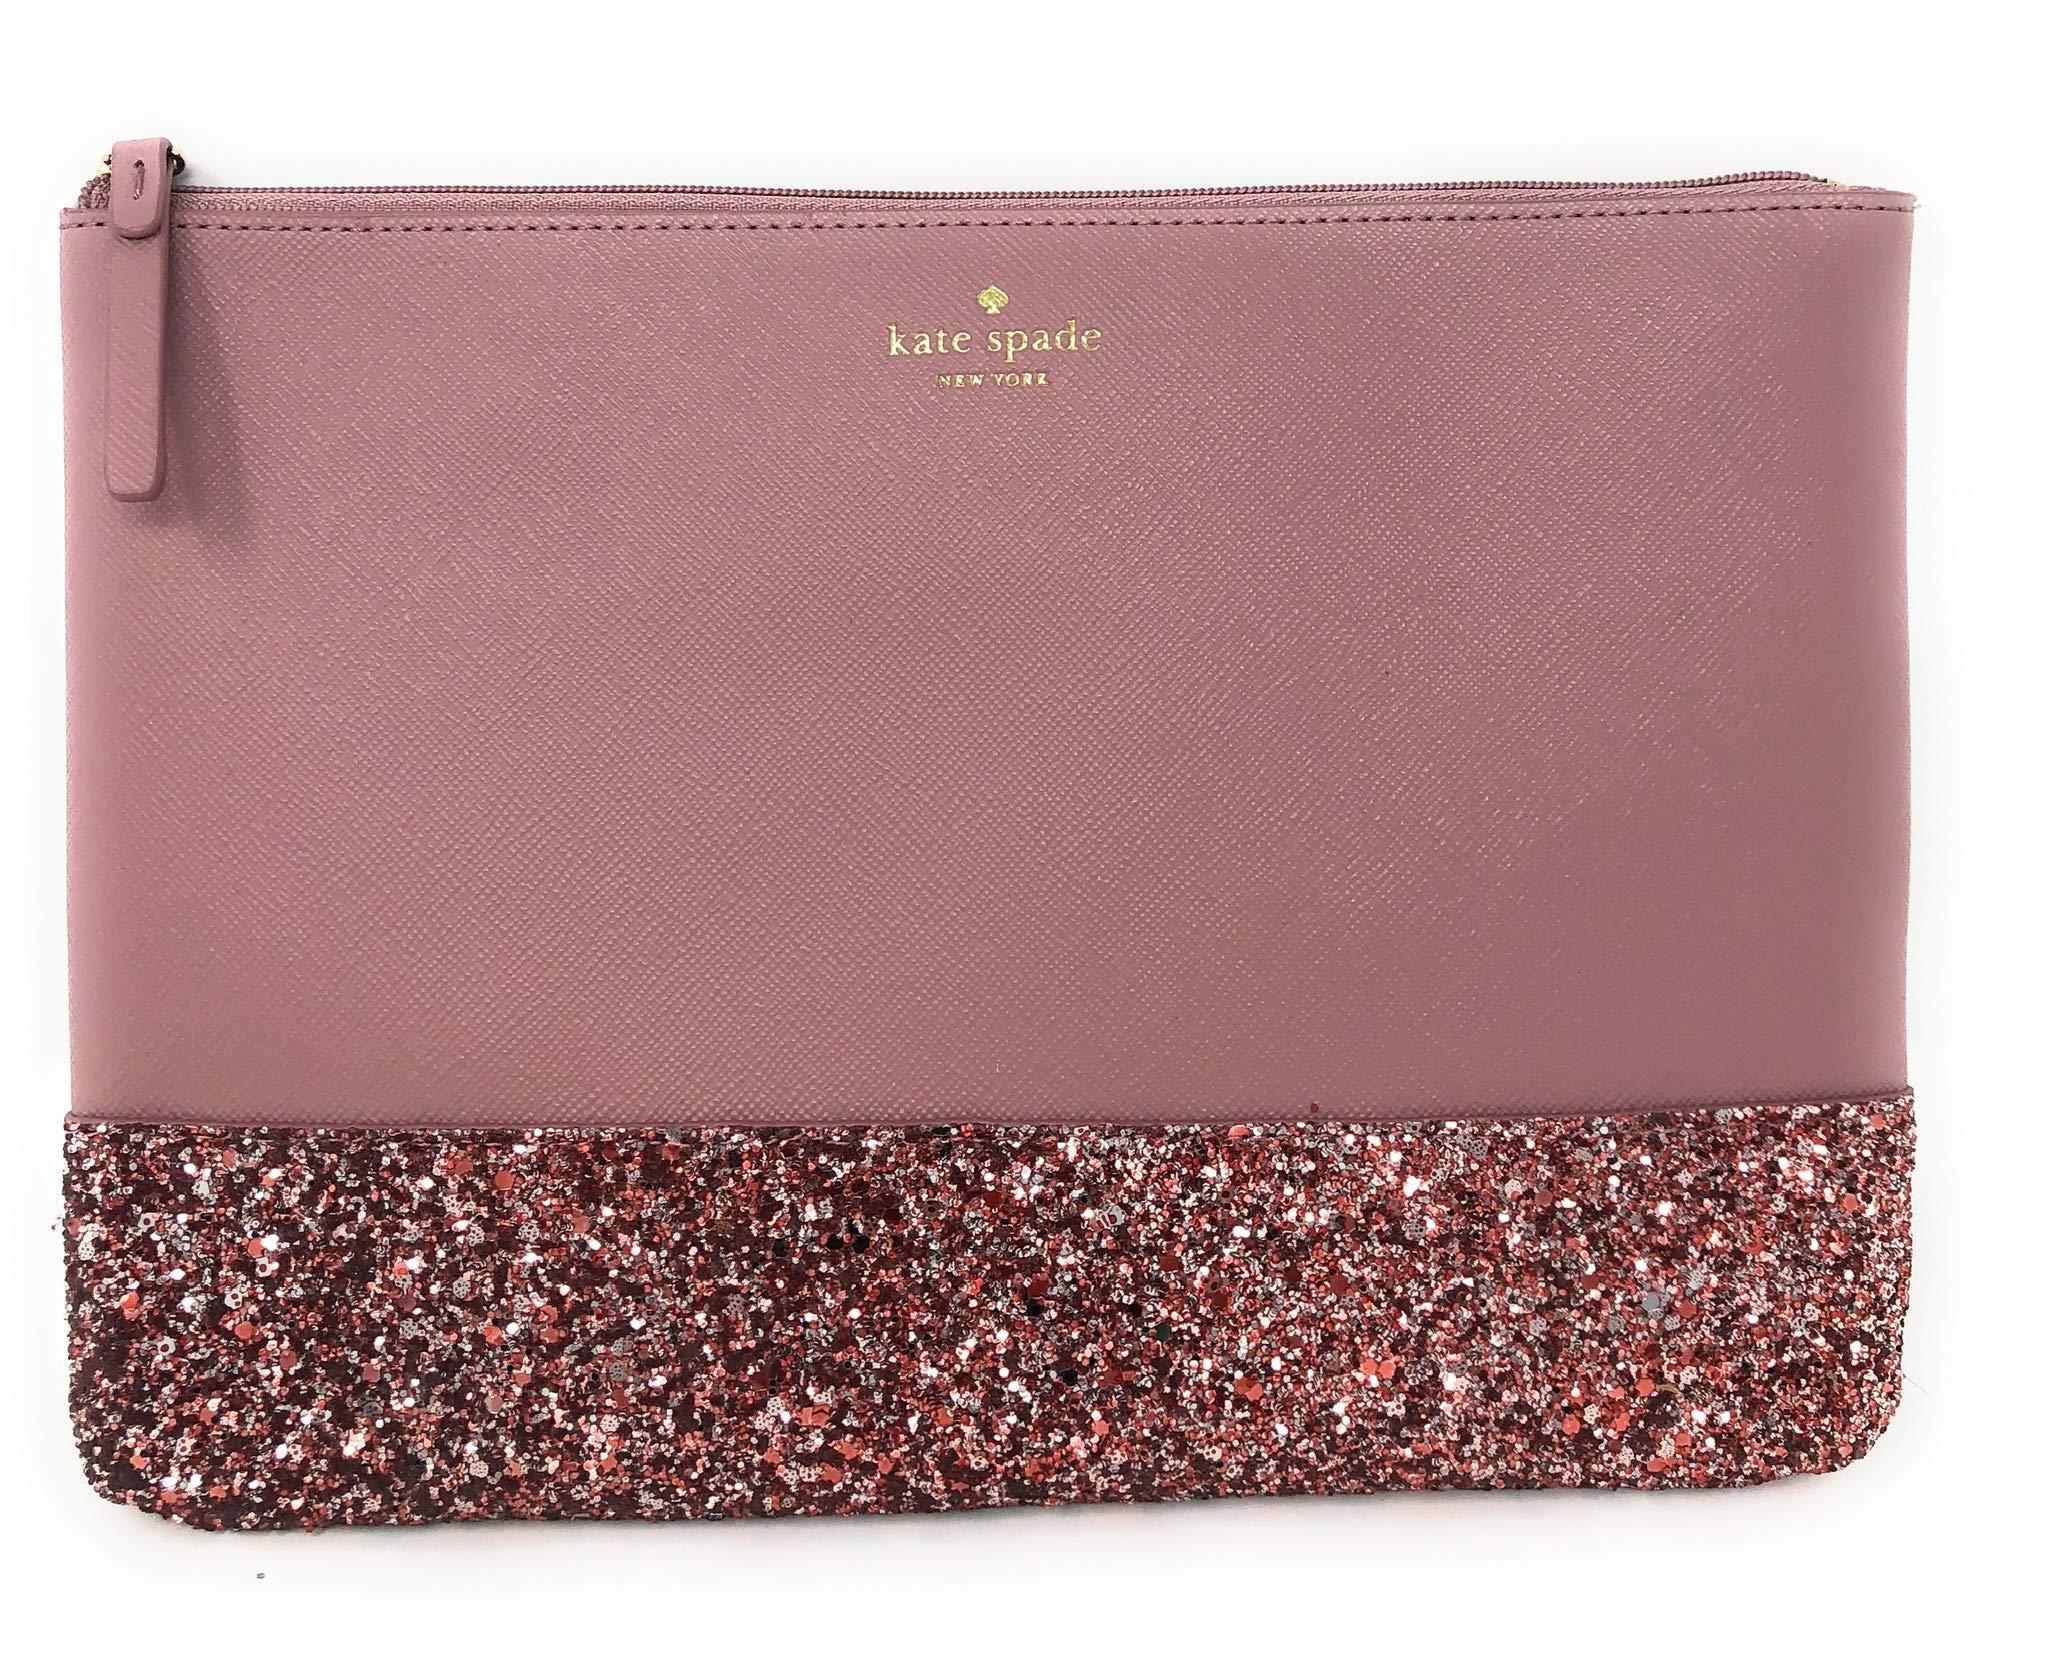 Kate Spade New York Leather Glitter Gia Greta Street Clutch Bag Pink